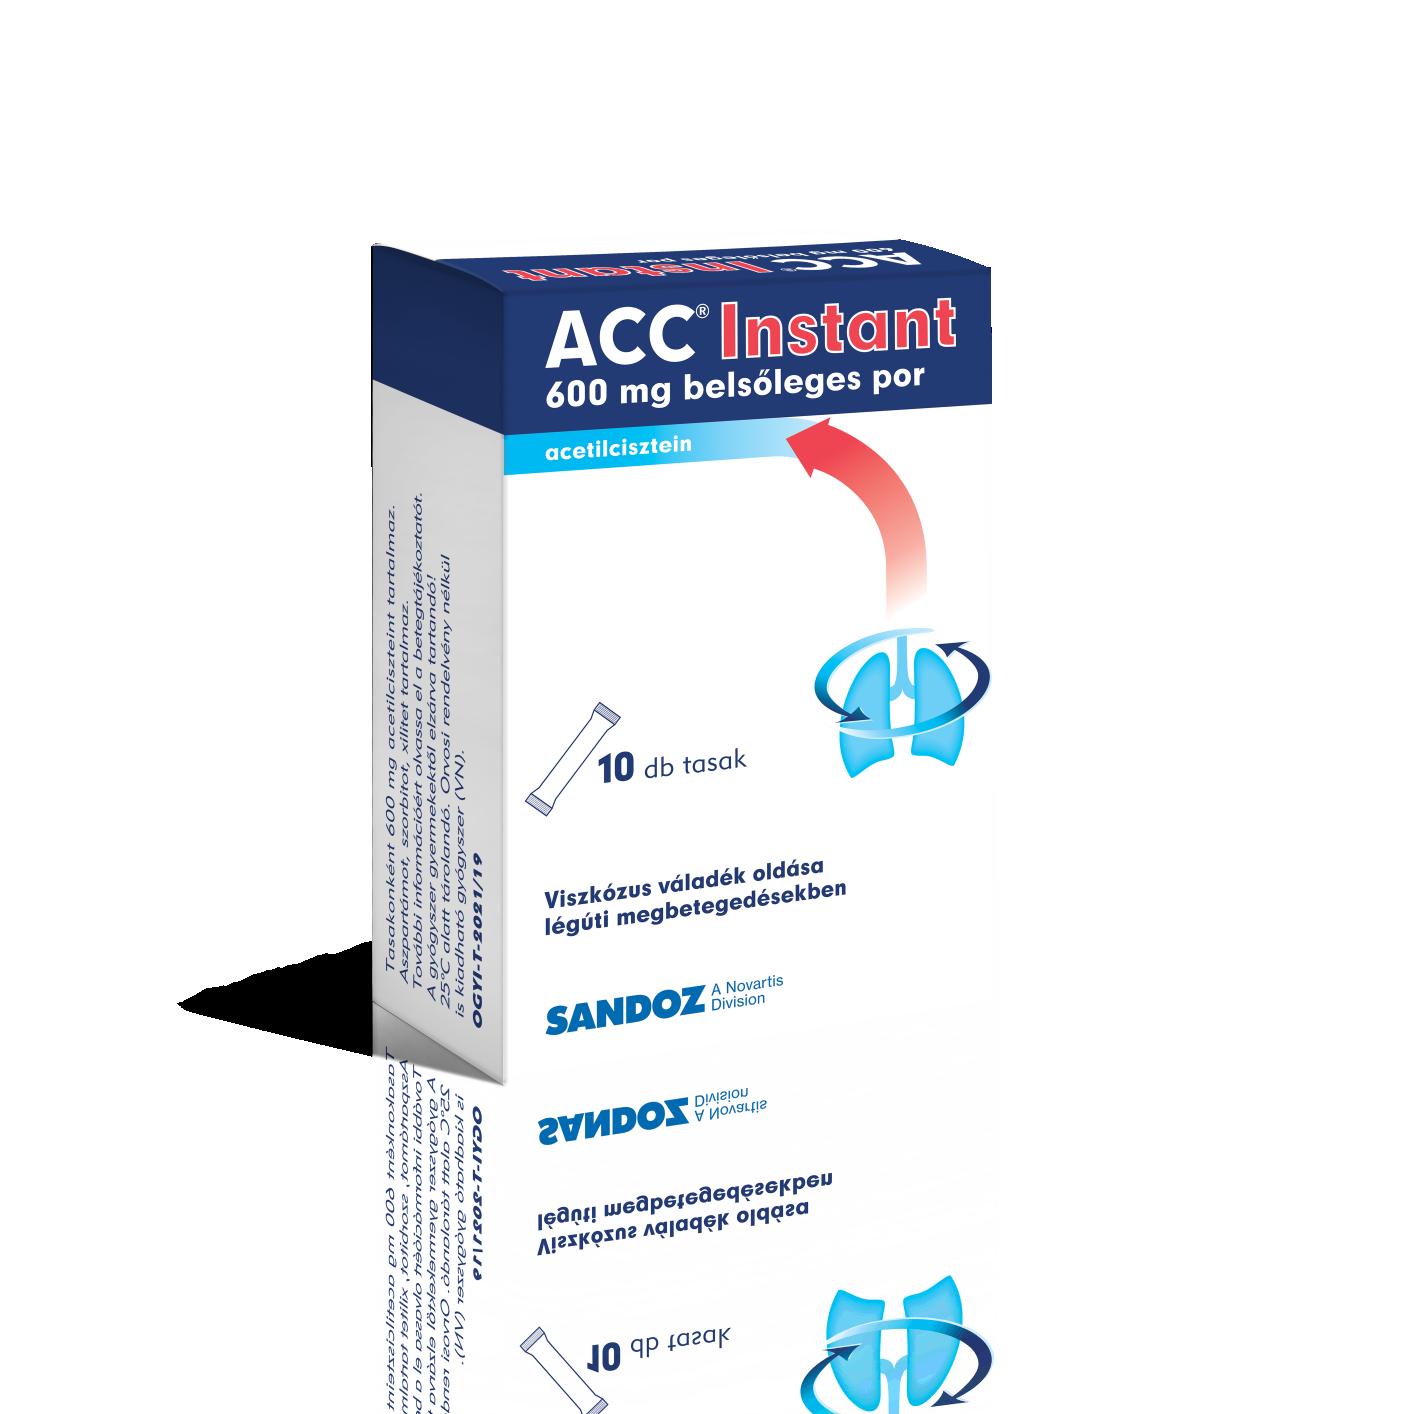 Acc Instant 600 mg belsőleges por 10x